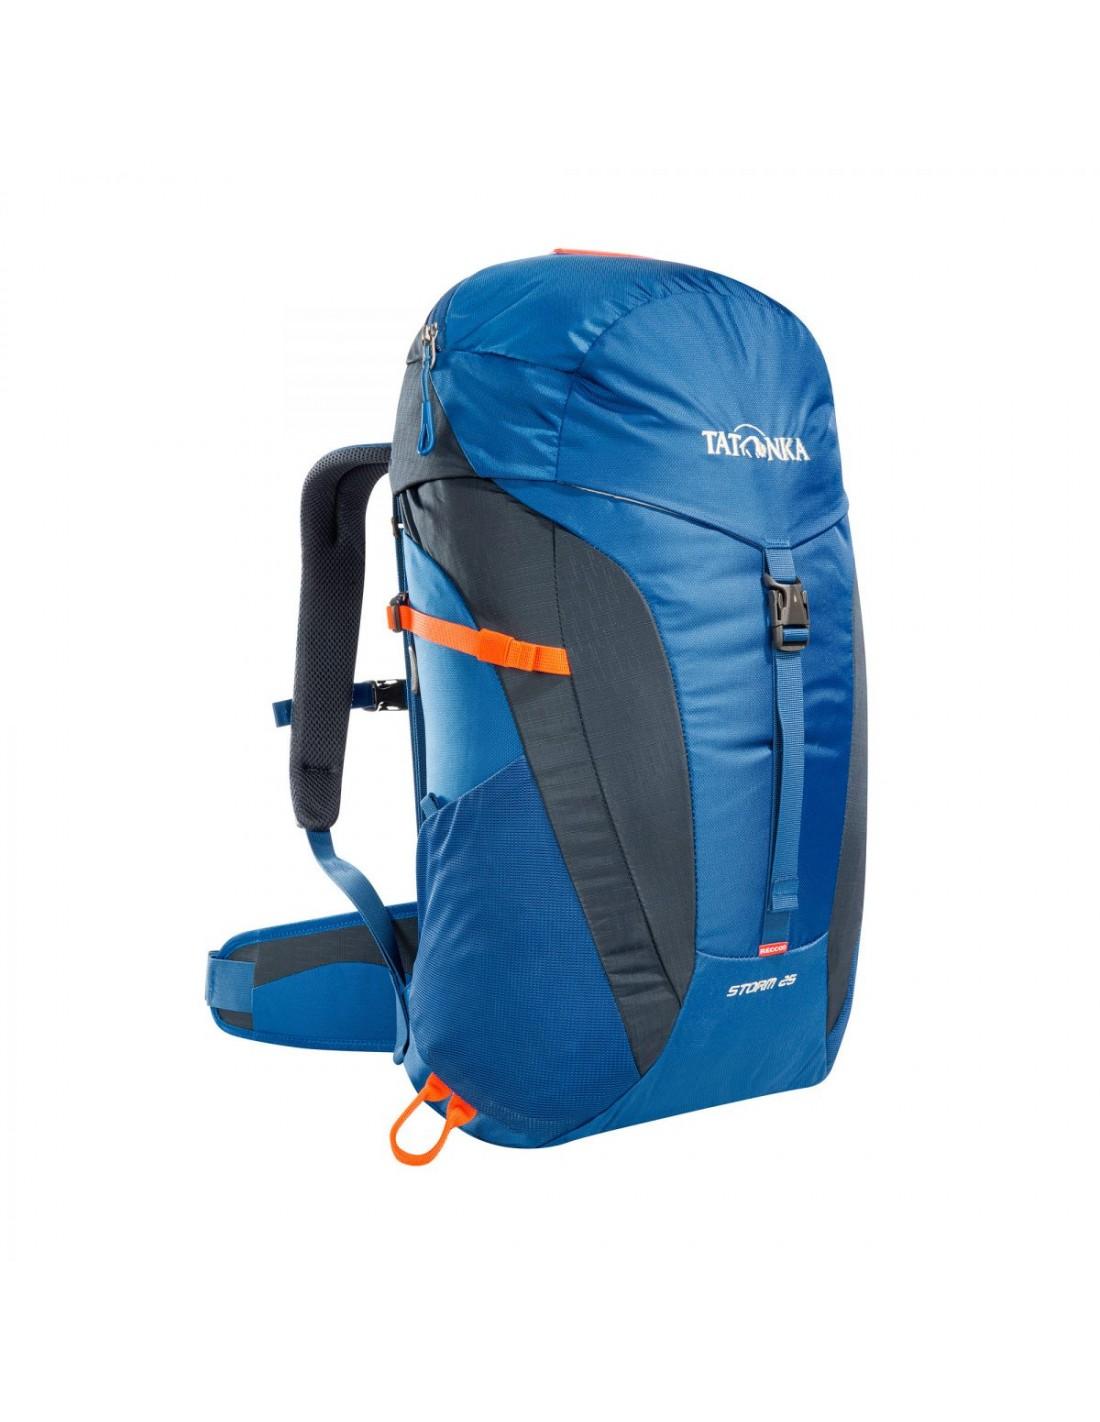 Tatonka Rucksack Storm 25 Recco, blue Rucksackart - Wandern & Trekking, Ruc günstig online kaufen